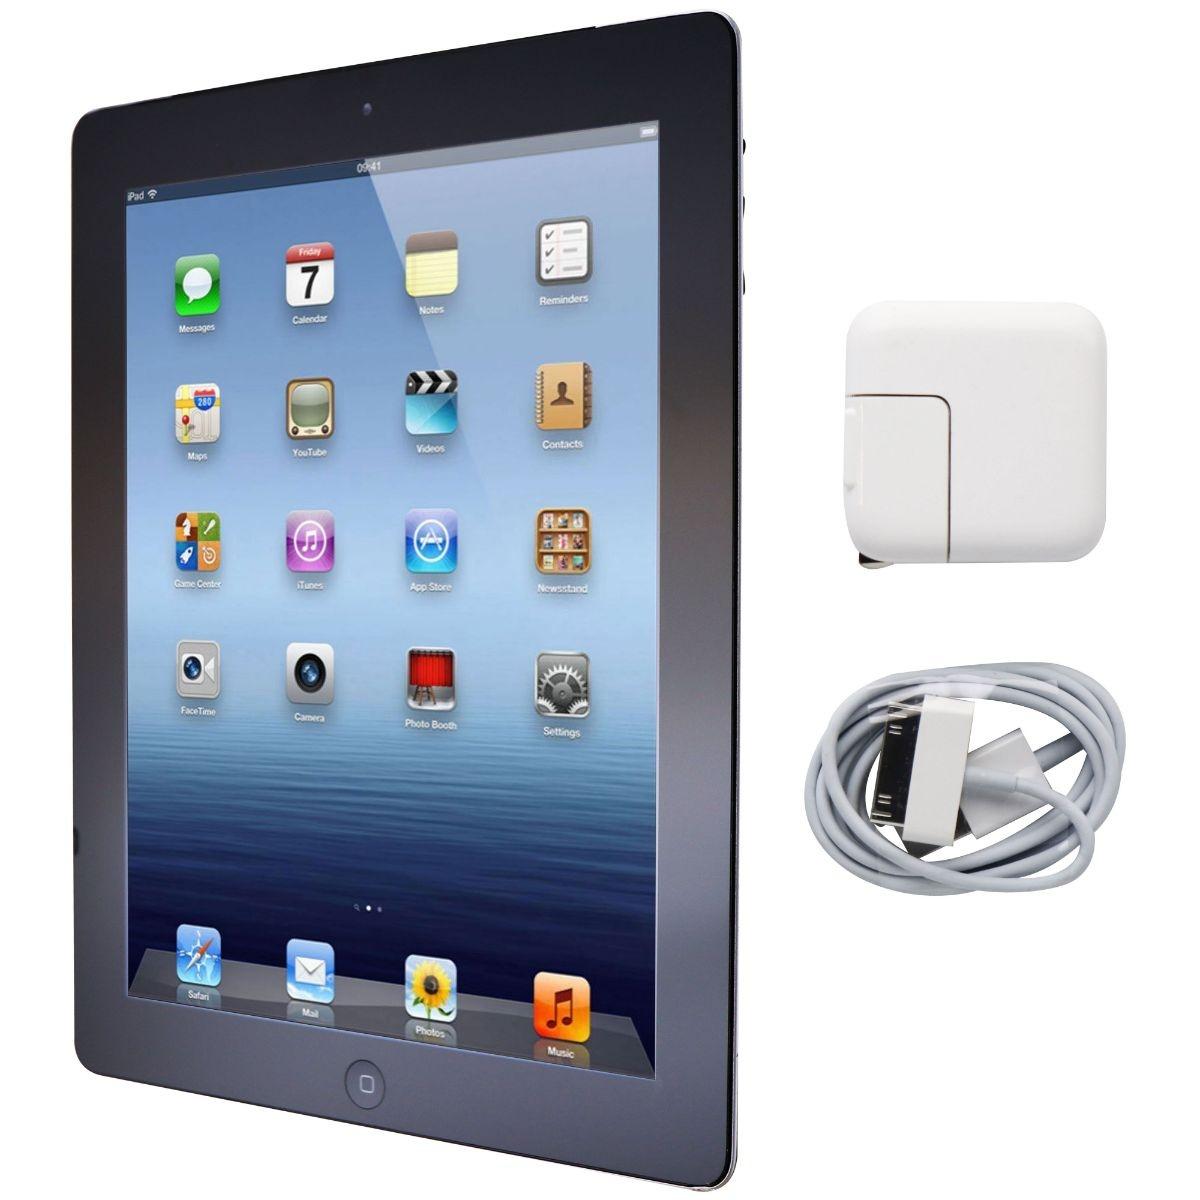 Apple iPad 9.7 (2nd Gen) Tablet A1397 (GSM Unlocked + Verizon) - 64GB / Black